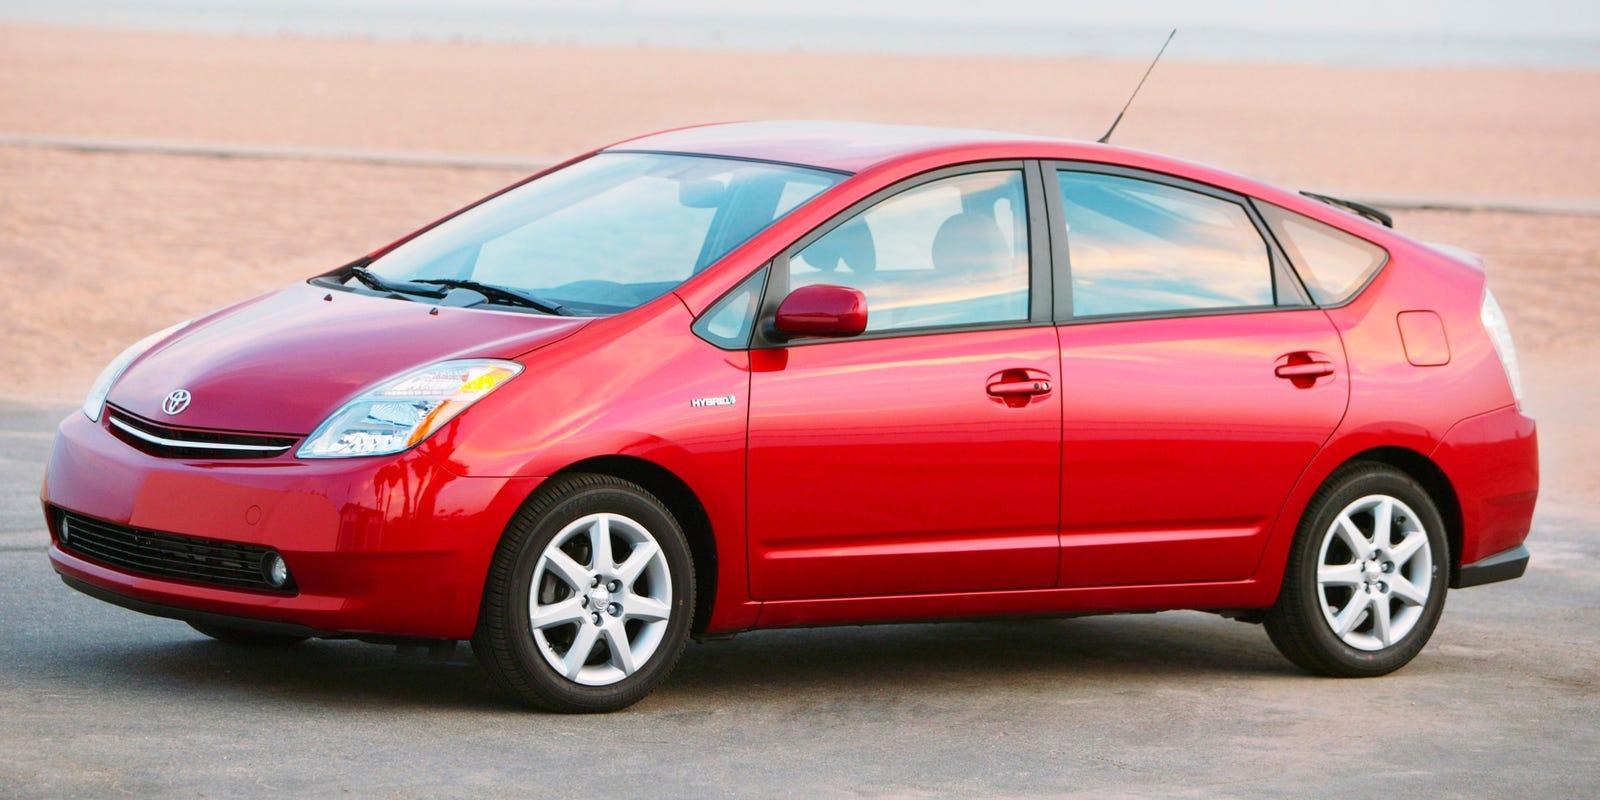 Toyota recalls U.S. Priuses in 2.77M global recall